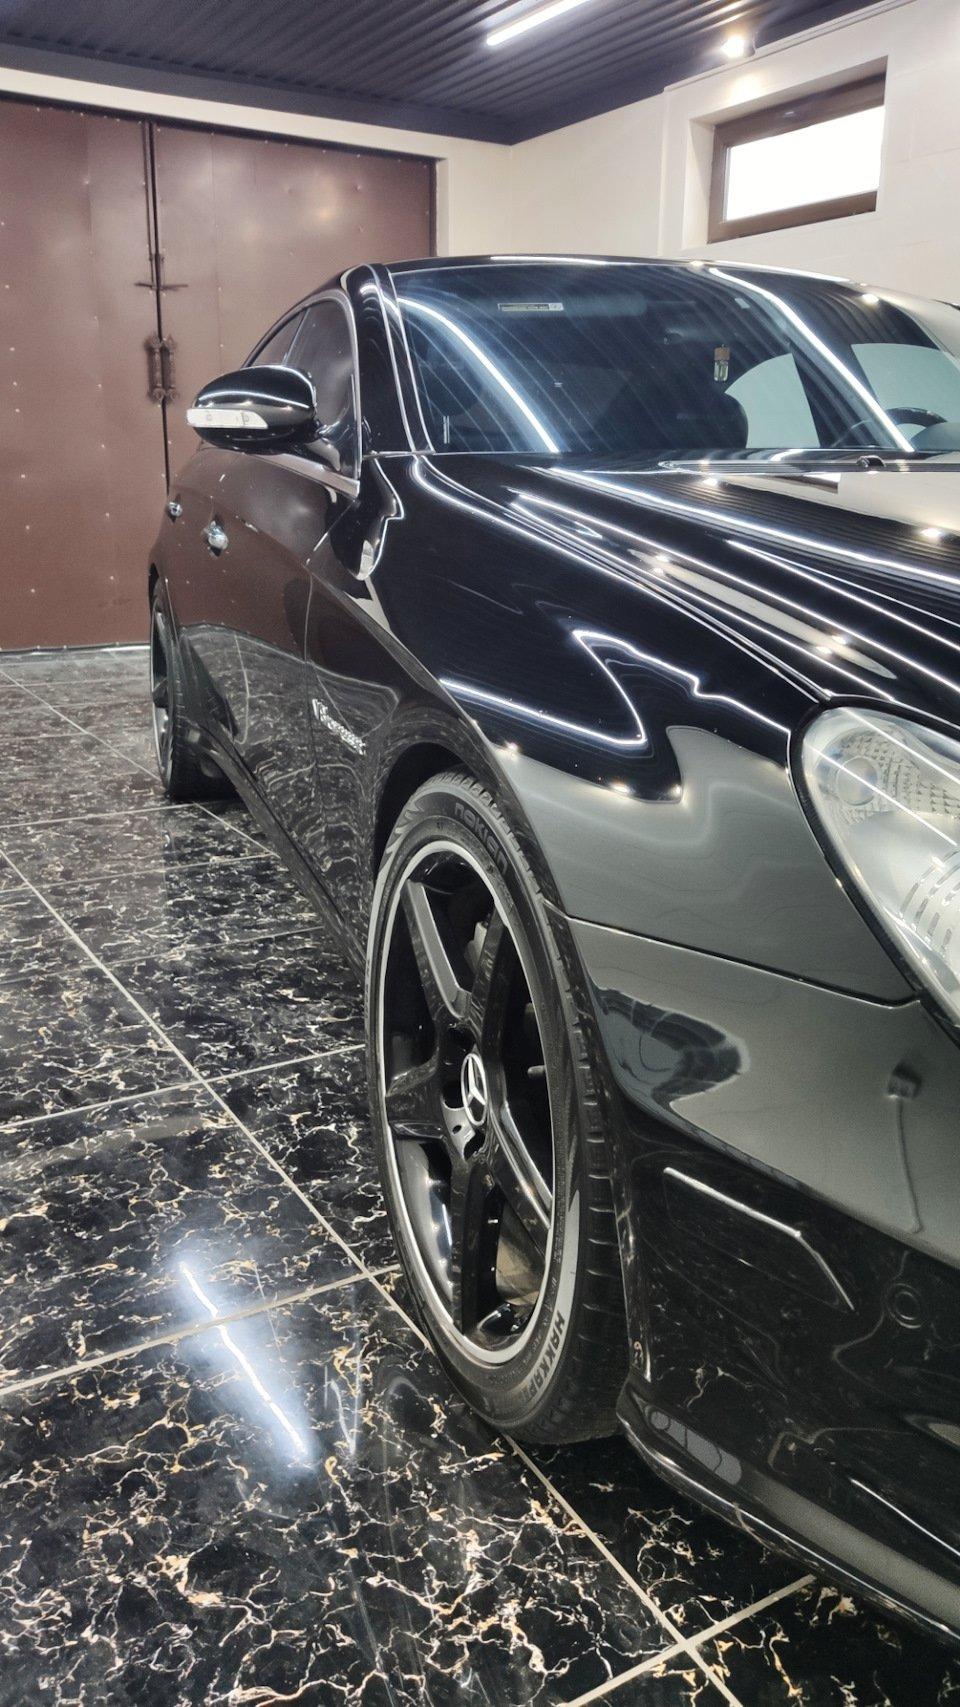 Mercedes CLS55 AMG Black (31)